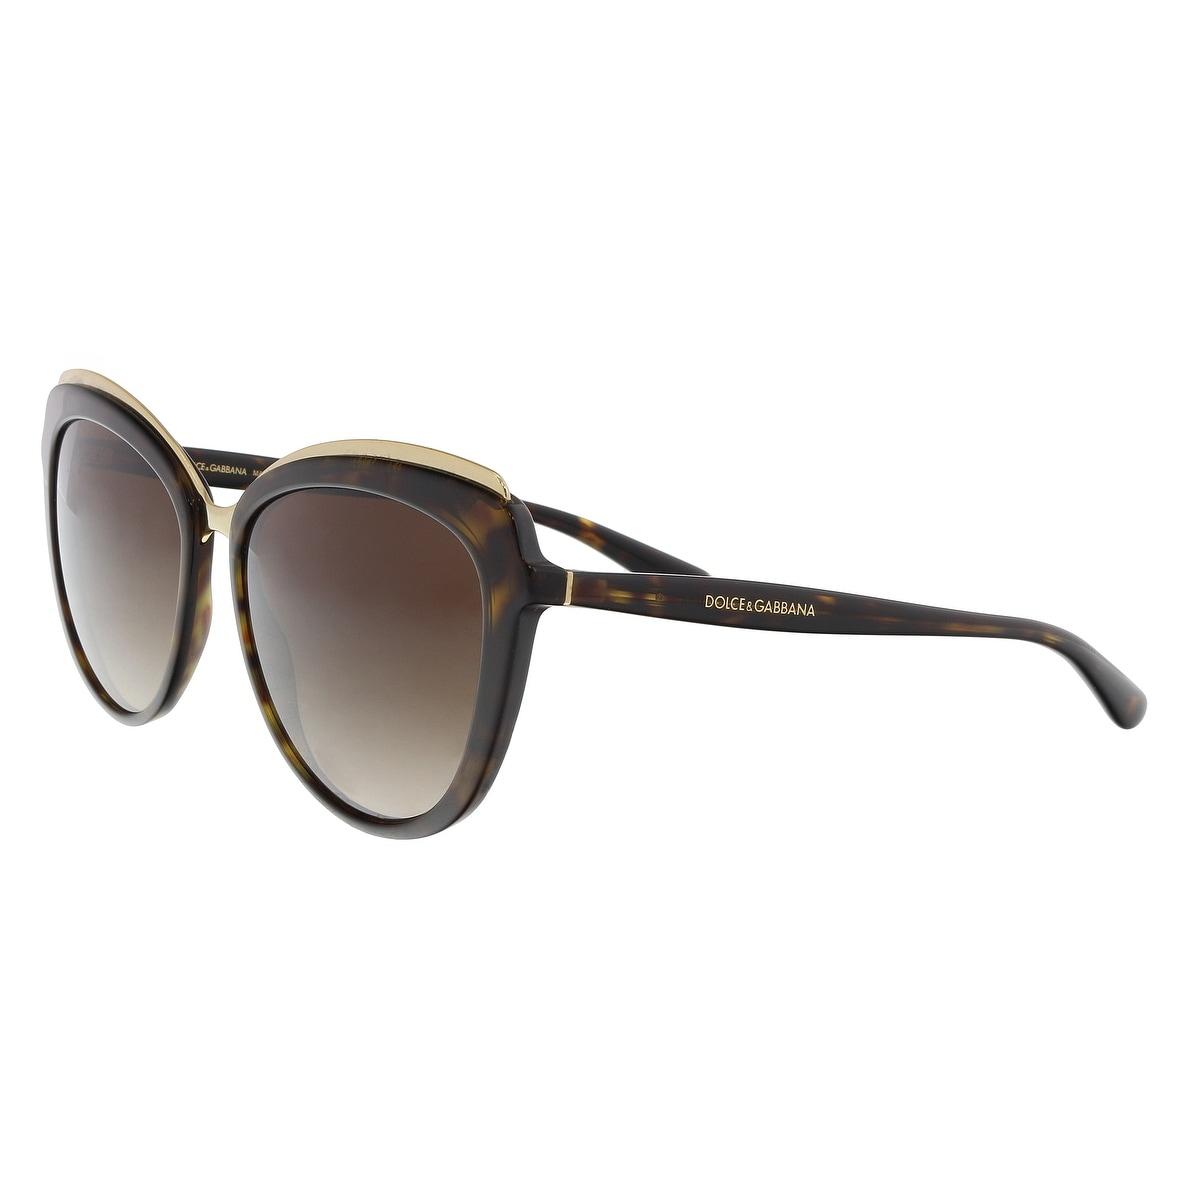 Havana Envío 17 Eye Dolce Gabbana 50213 21157985 Compra hoy gratis Dg4304 57 Sunglasses Cat 140 BqCwI